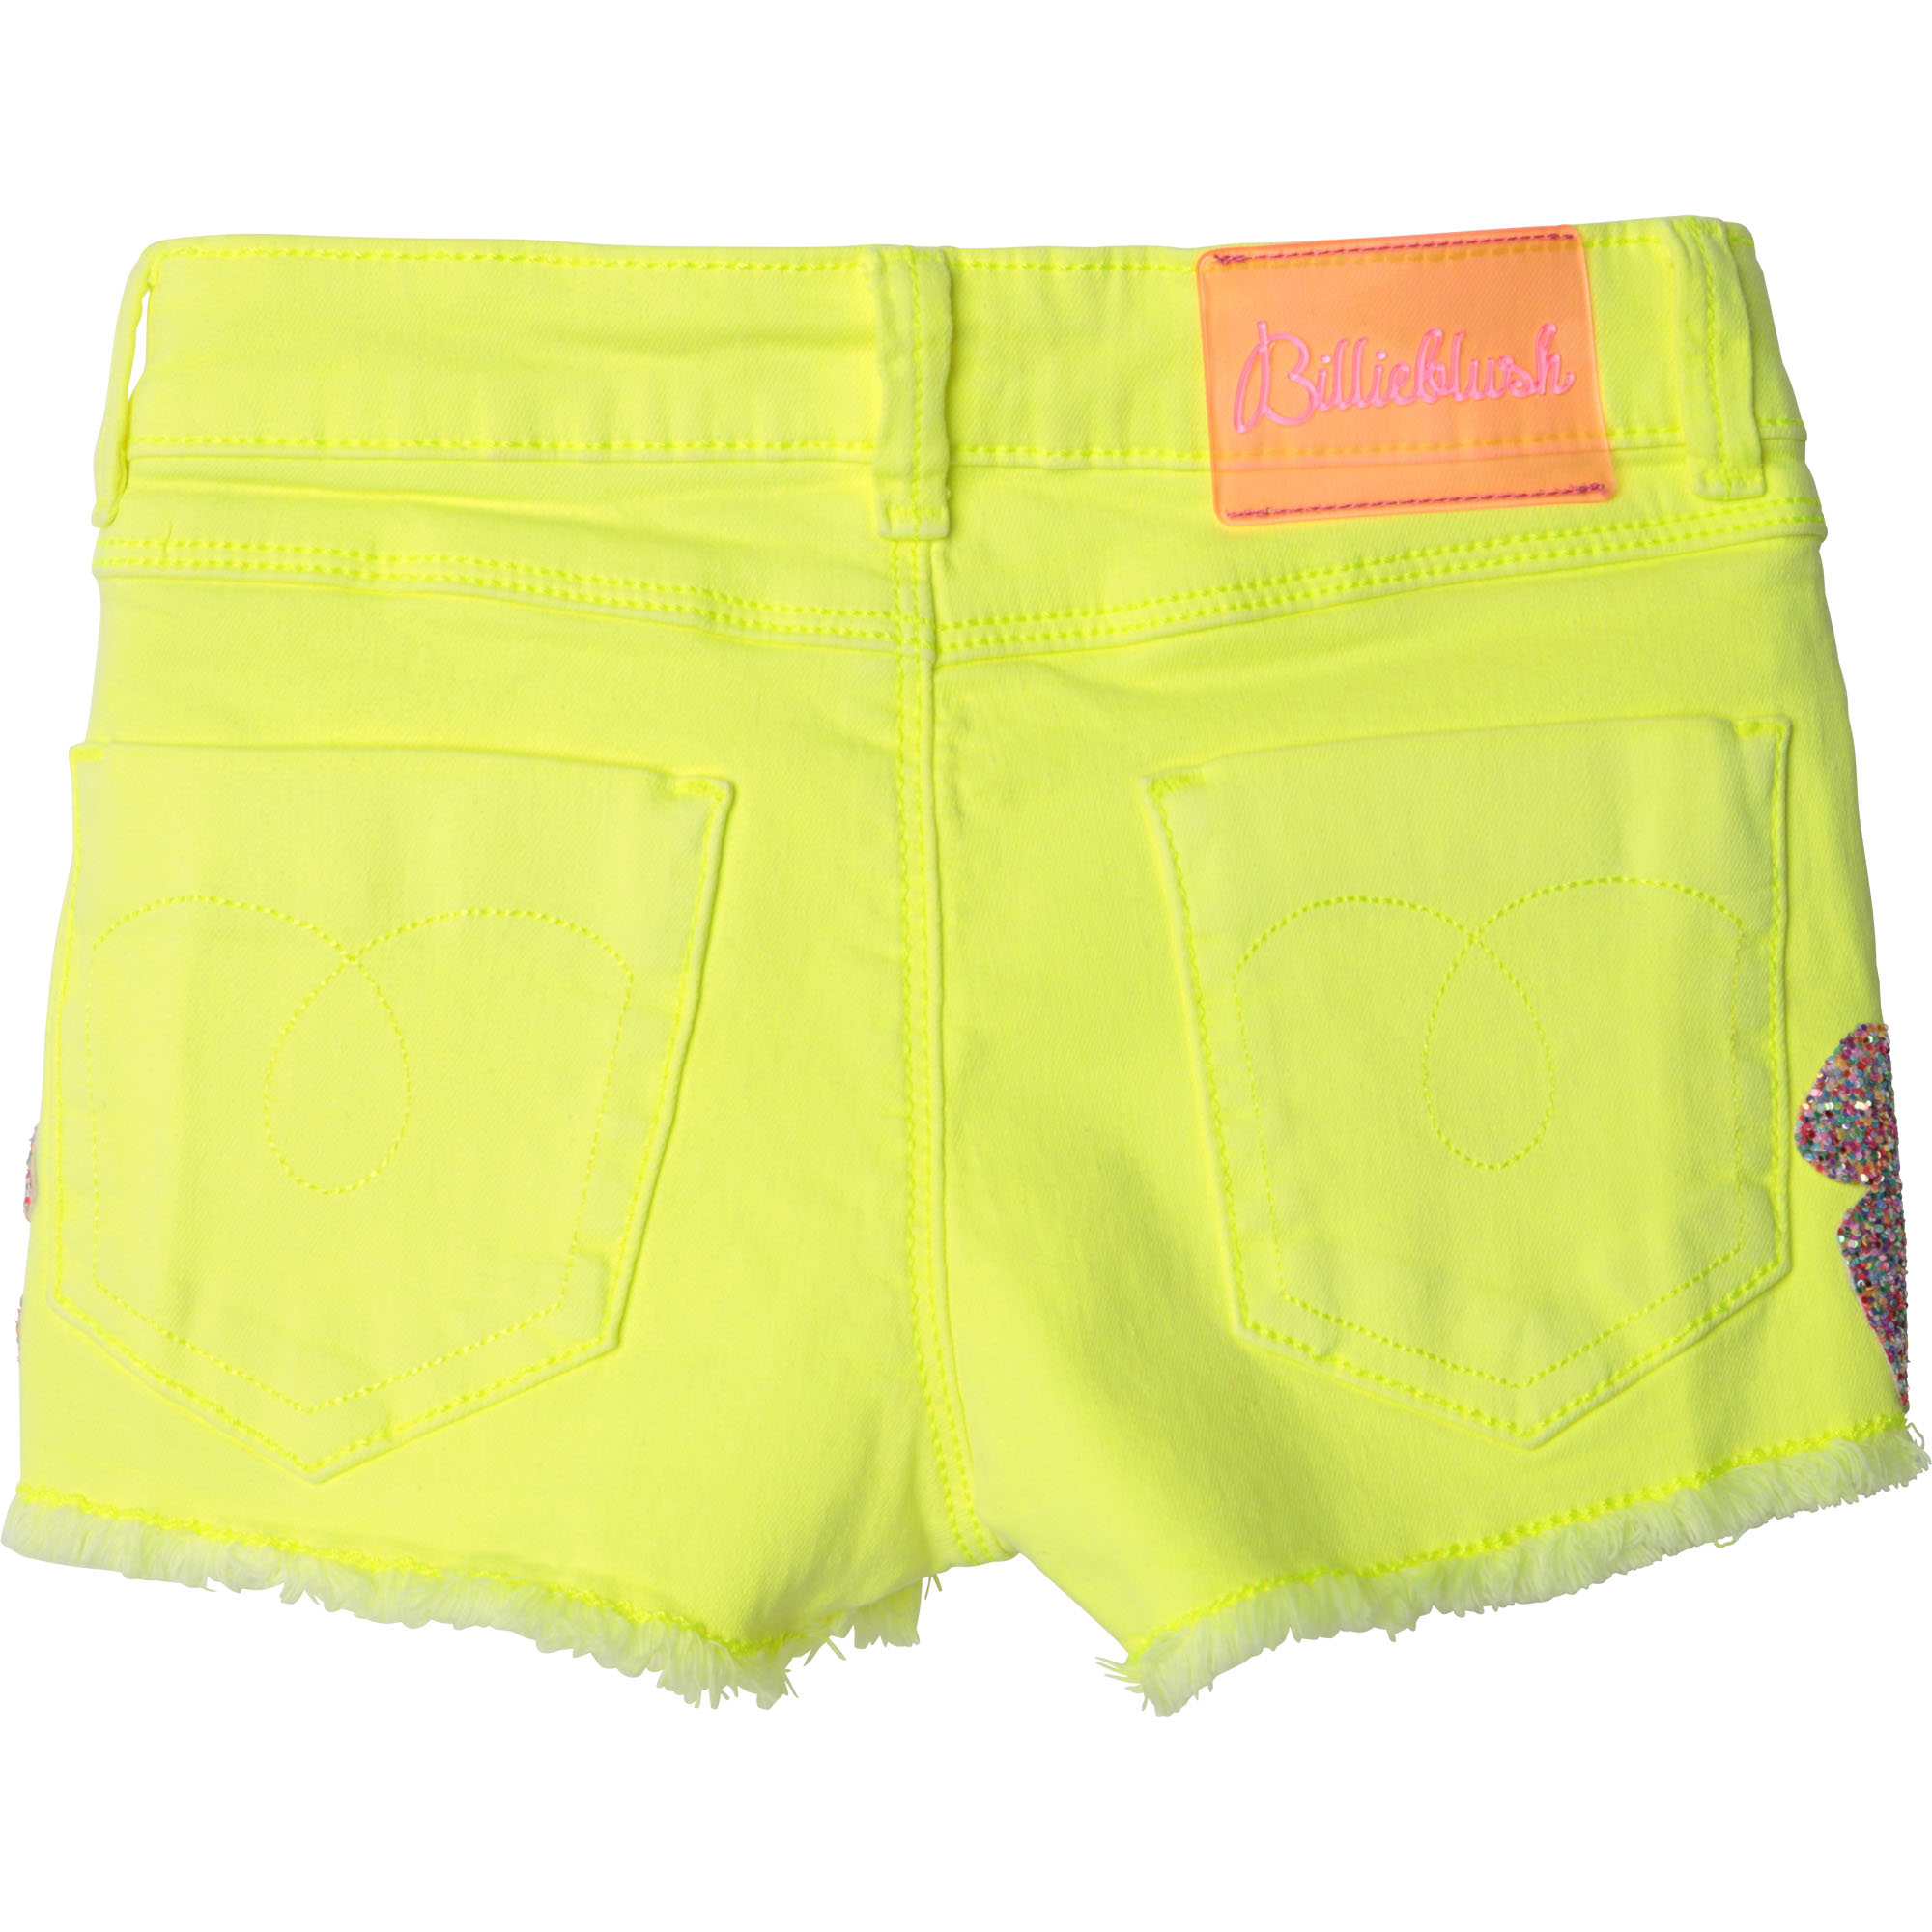 Cotton drill shorts BILLIEBLUSH for GIRL